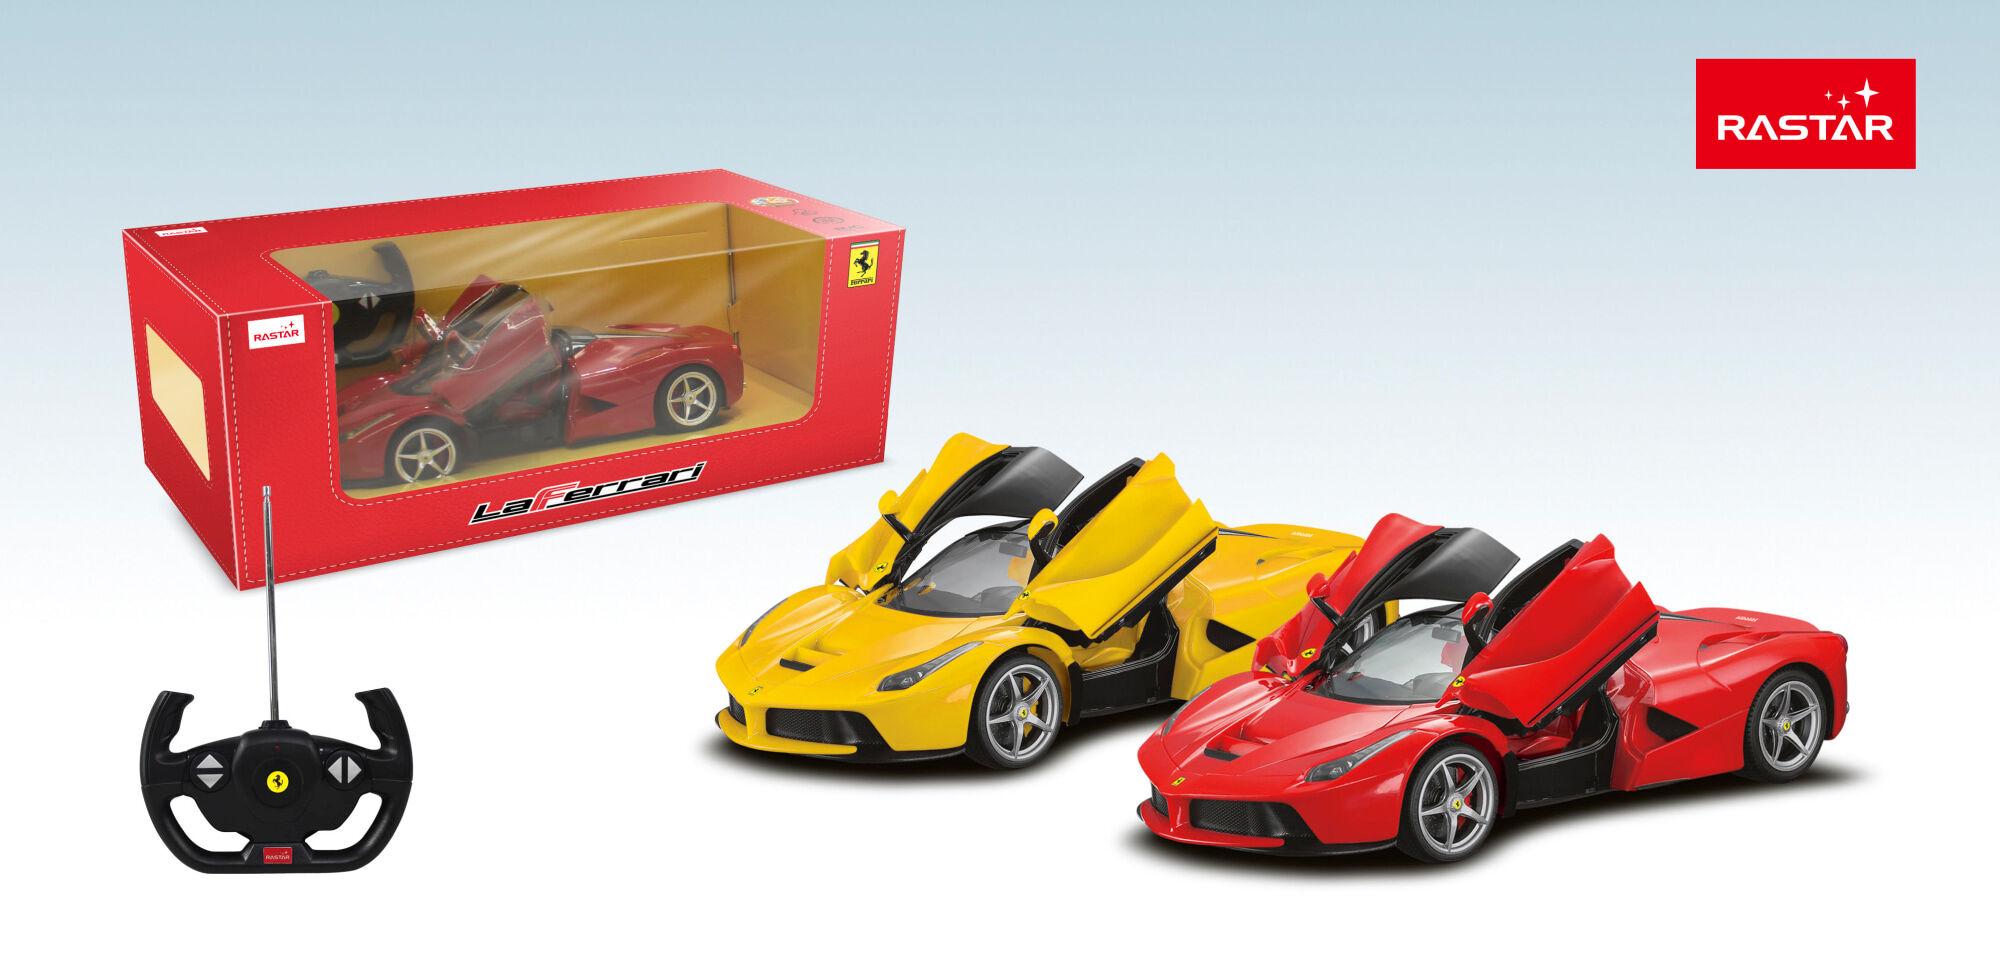 Rastar R/C 1:14 Ferrari LaFerrari radio-ohjattava auto